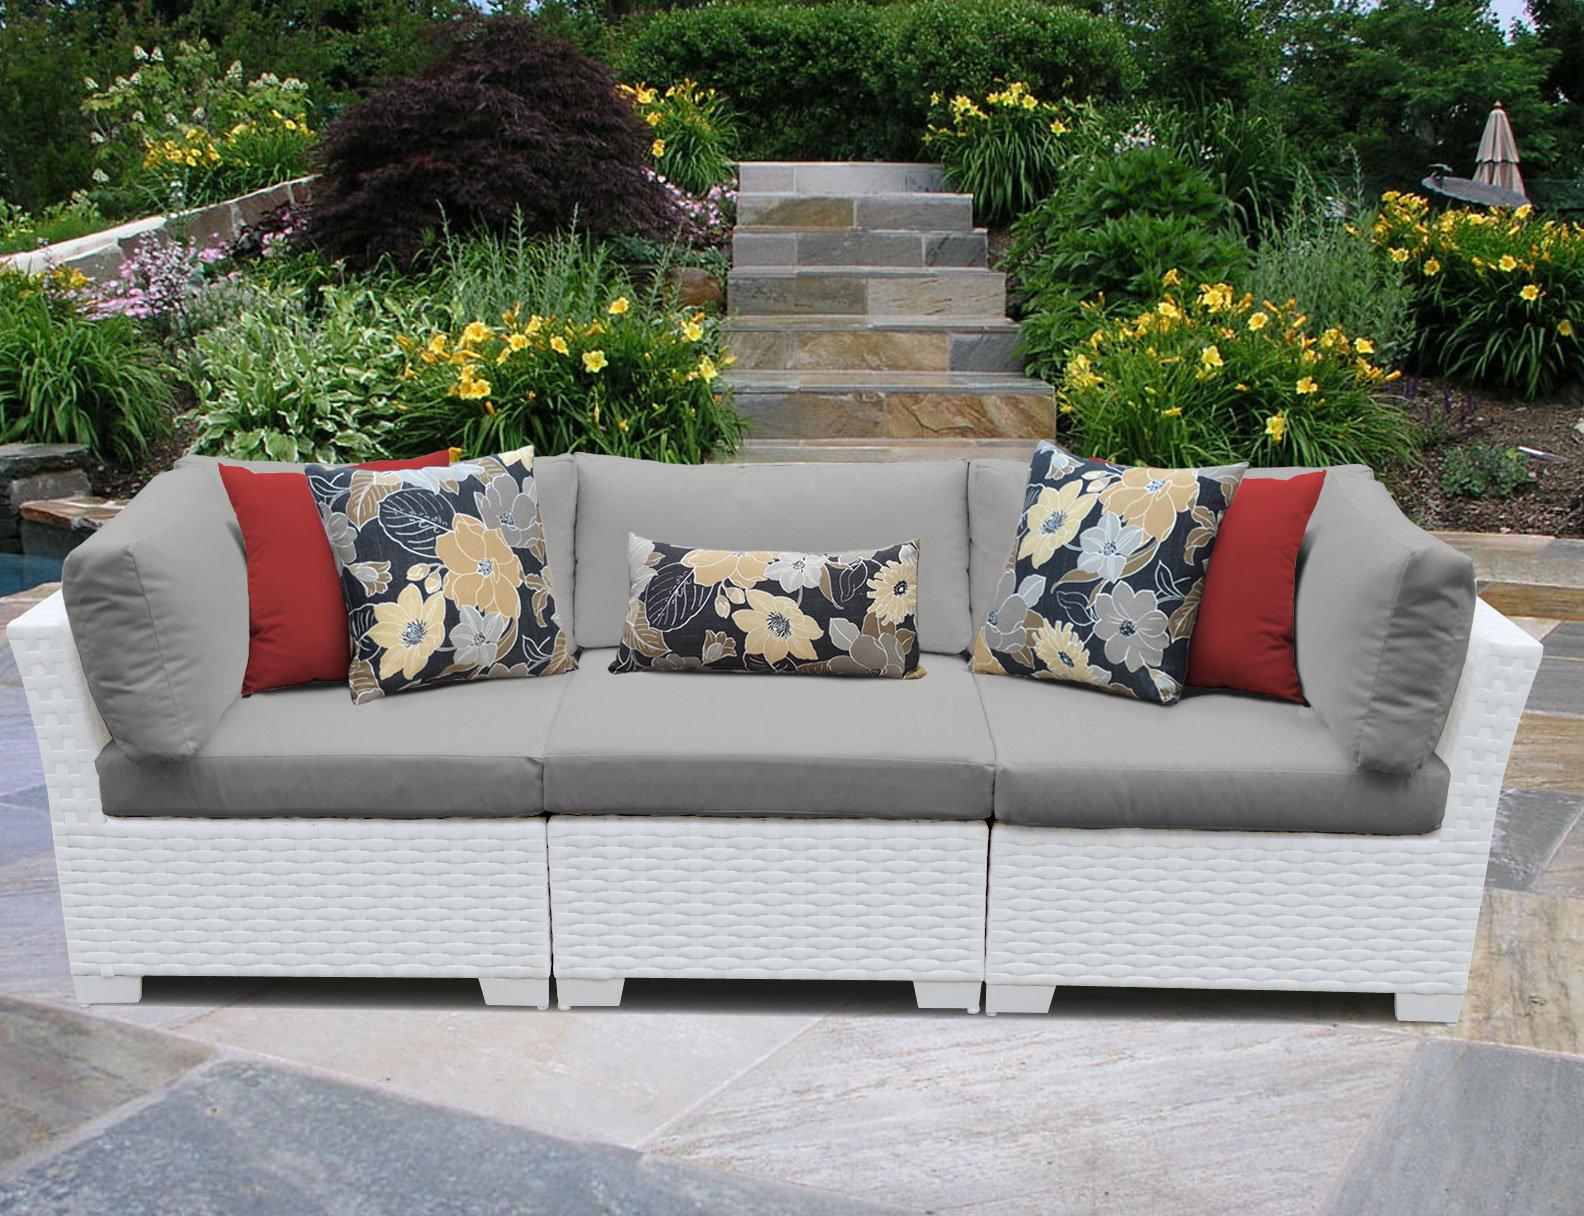 Most Popular Monaco Patio Sofa With Cushions With Vallauris Sofa With Cushions (View 5 of 20)